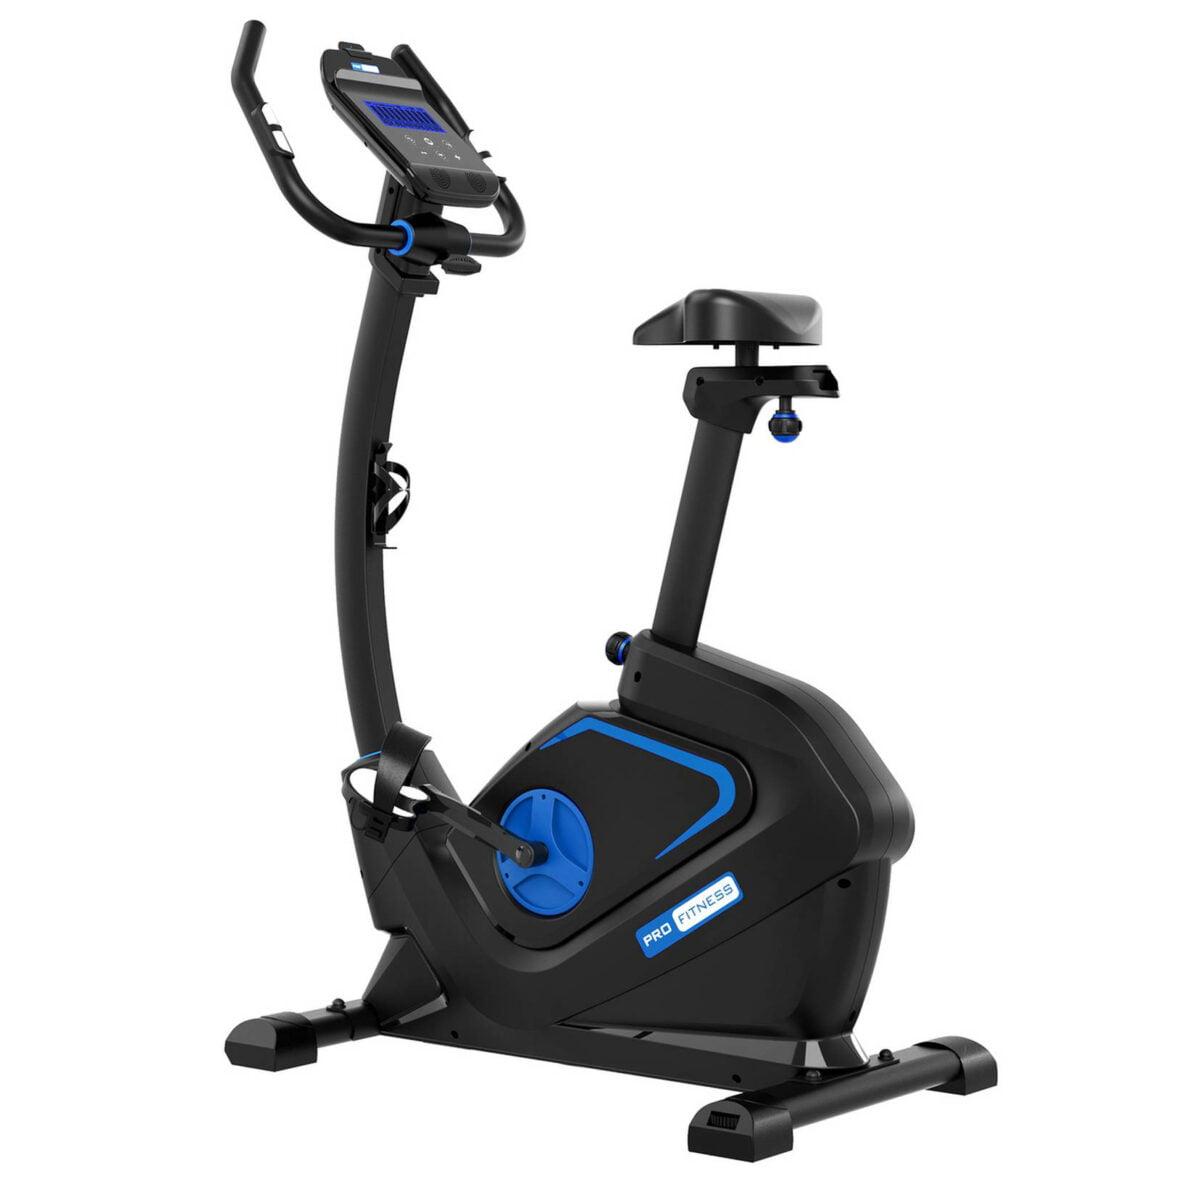 Pro Fitness EB3000 Exercise Bike Best Price UK Check